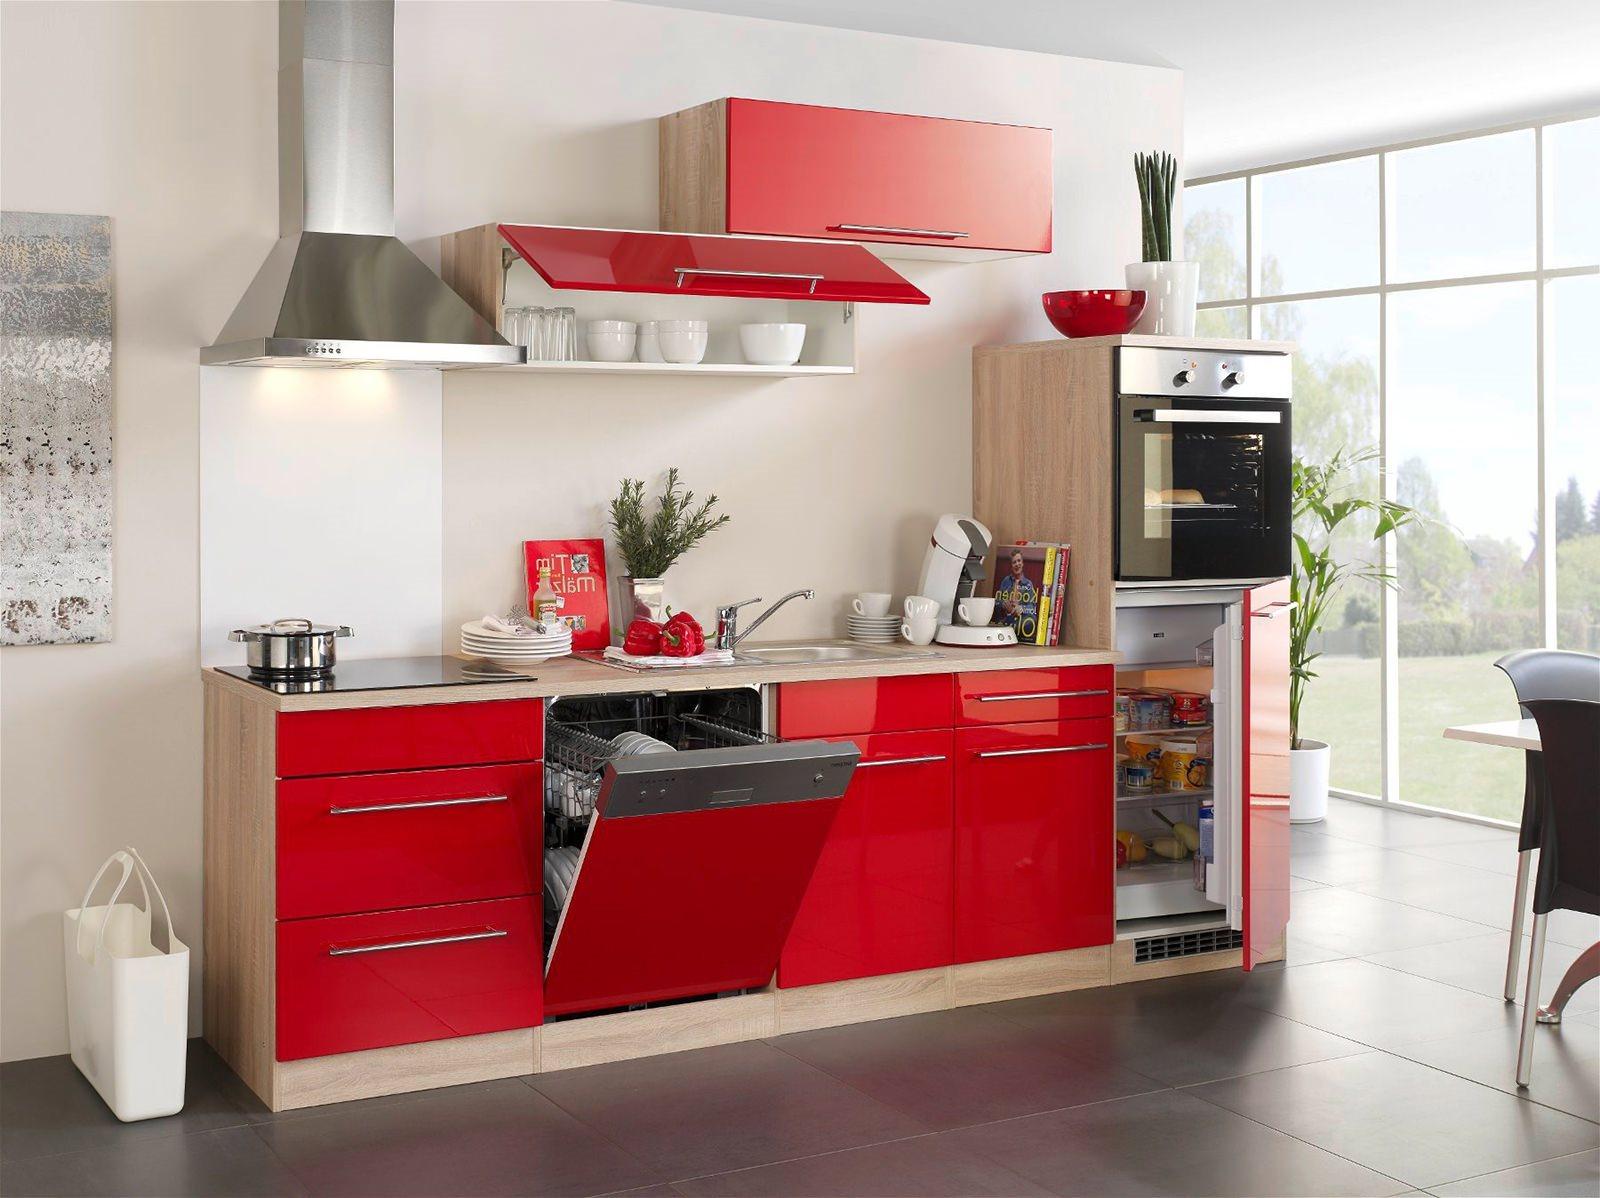 Красно-бежевый гарнитур на кухне